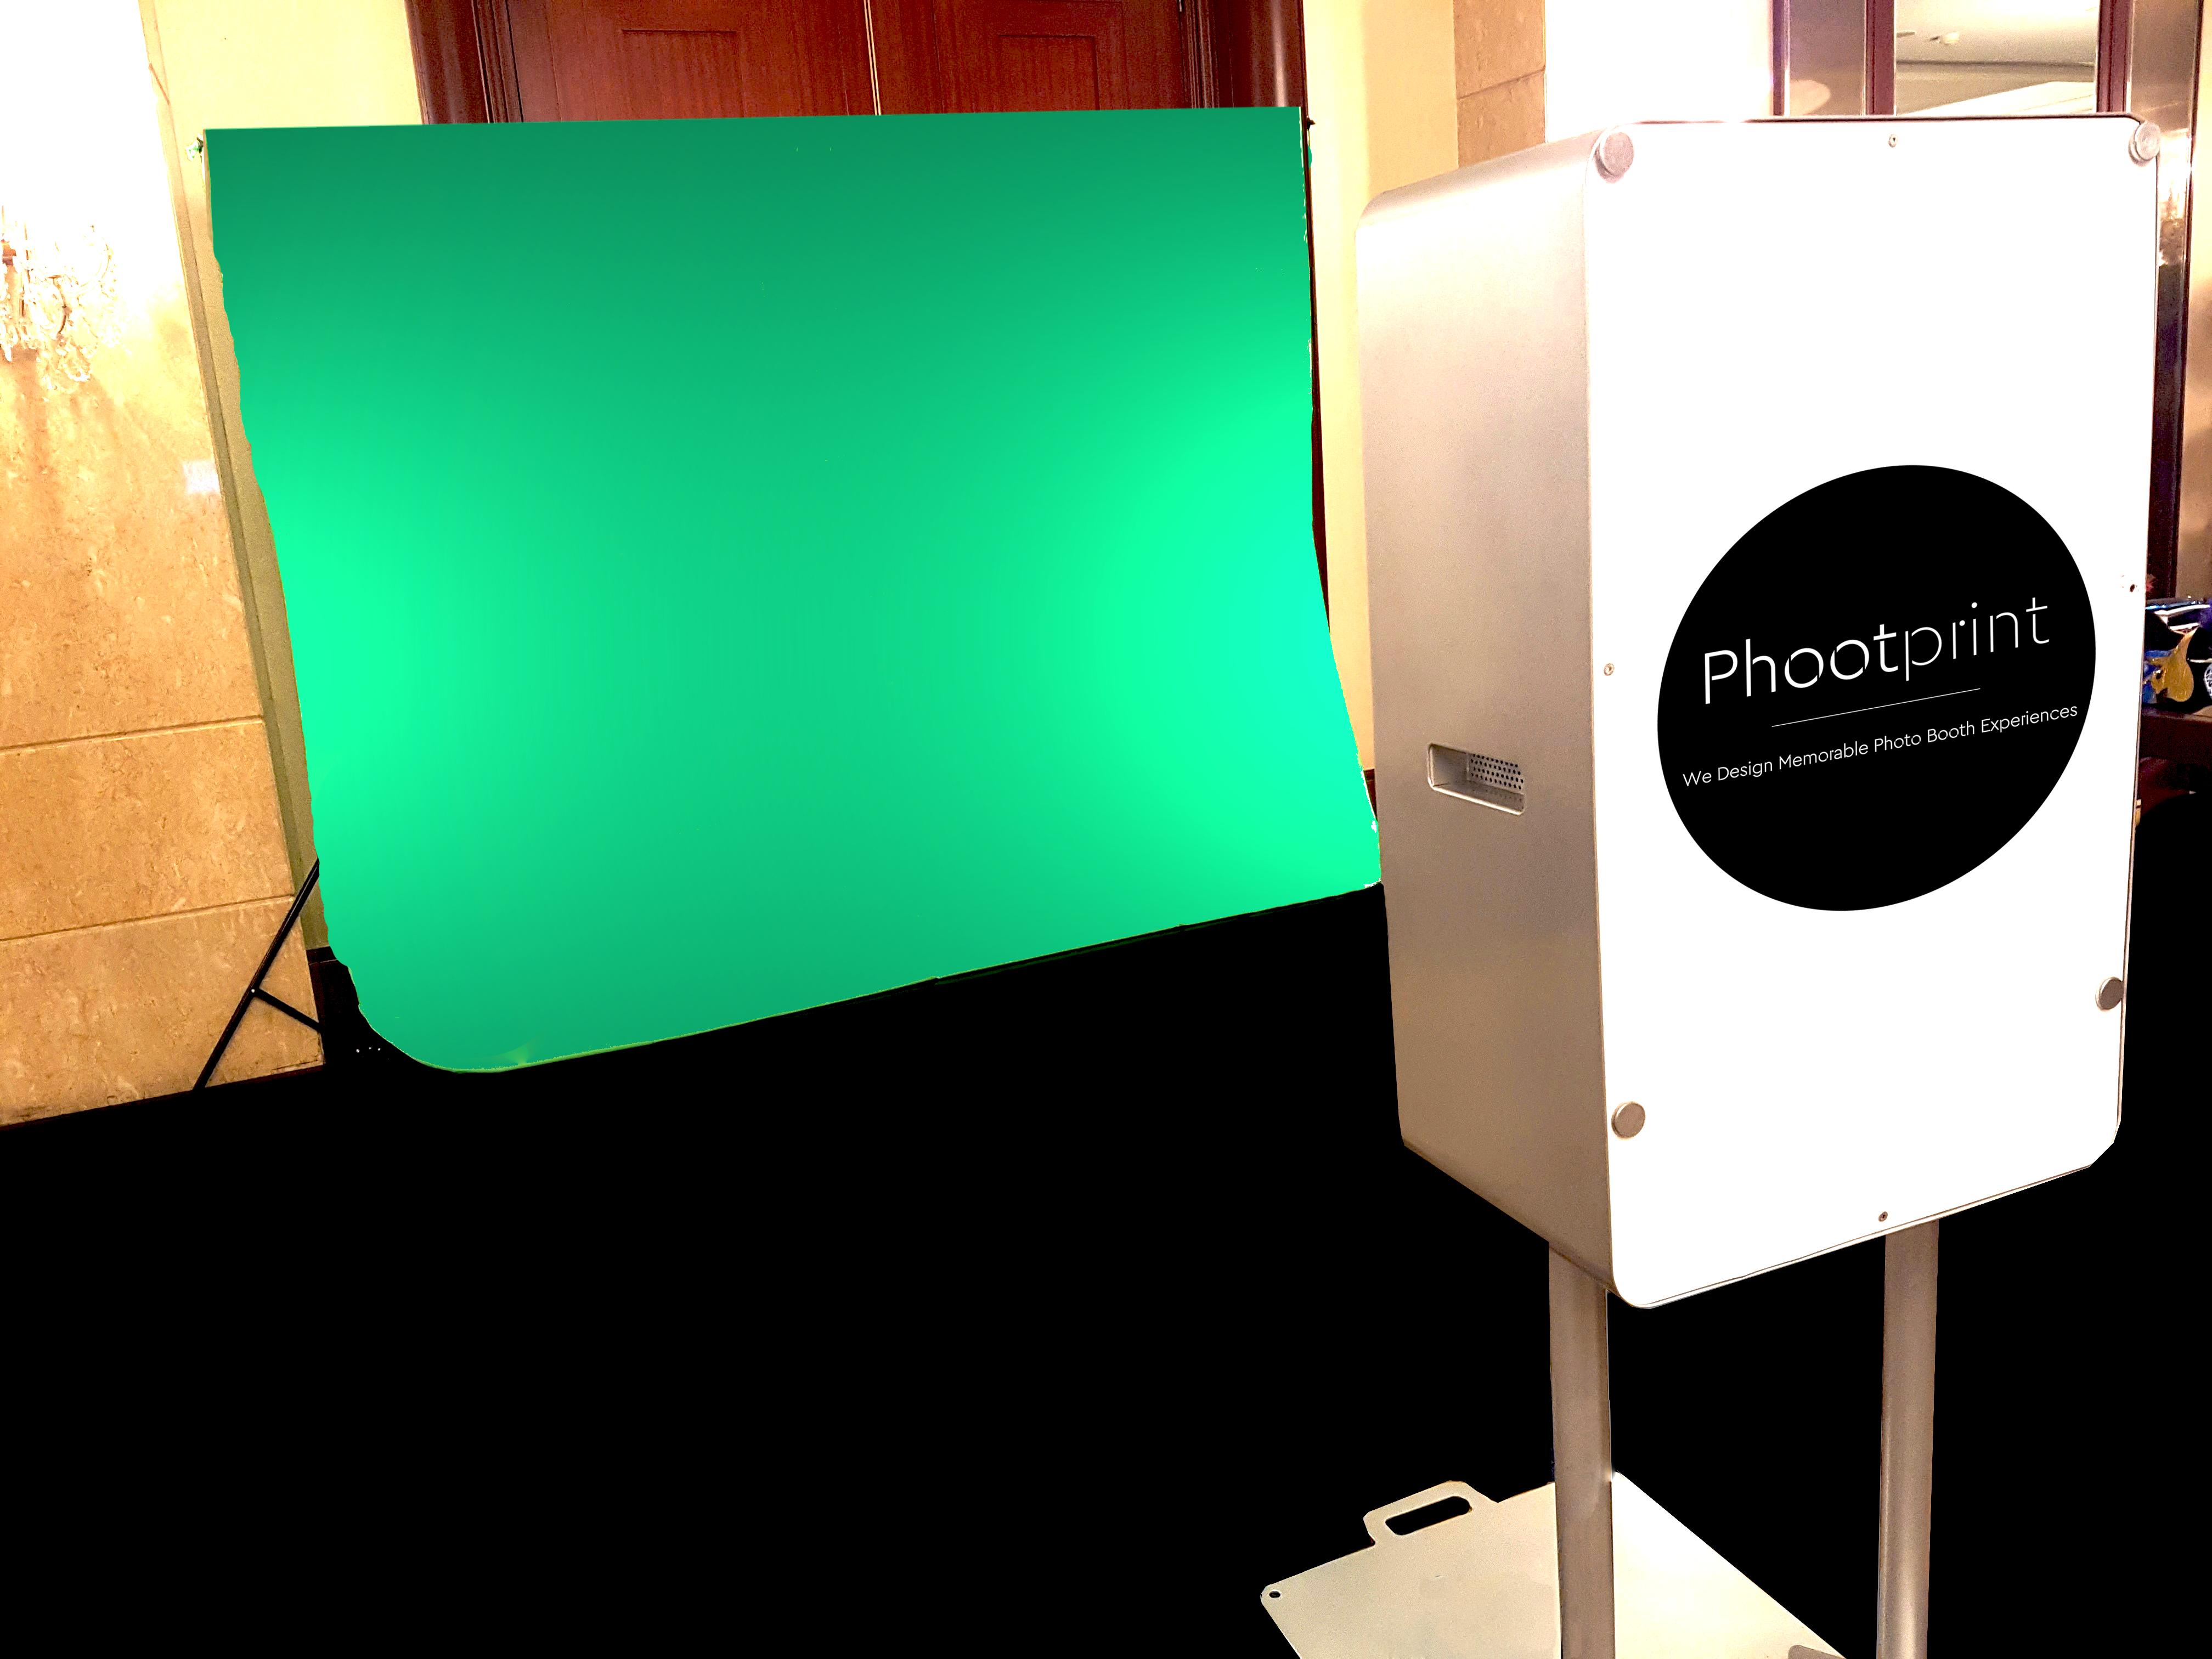 Phootprint - High Quality Photo Booth Experiences